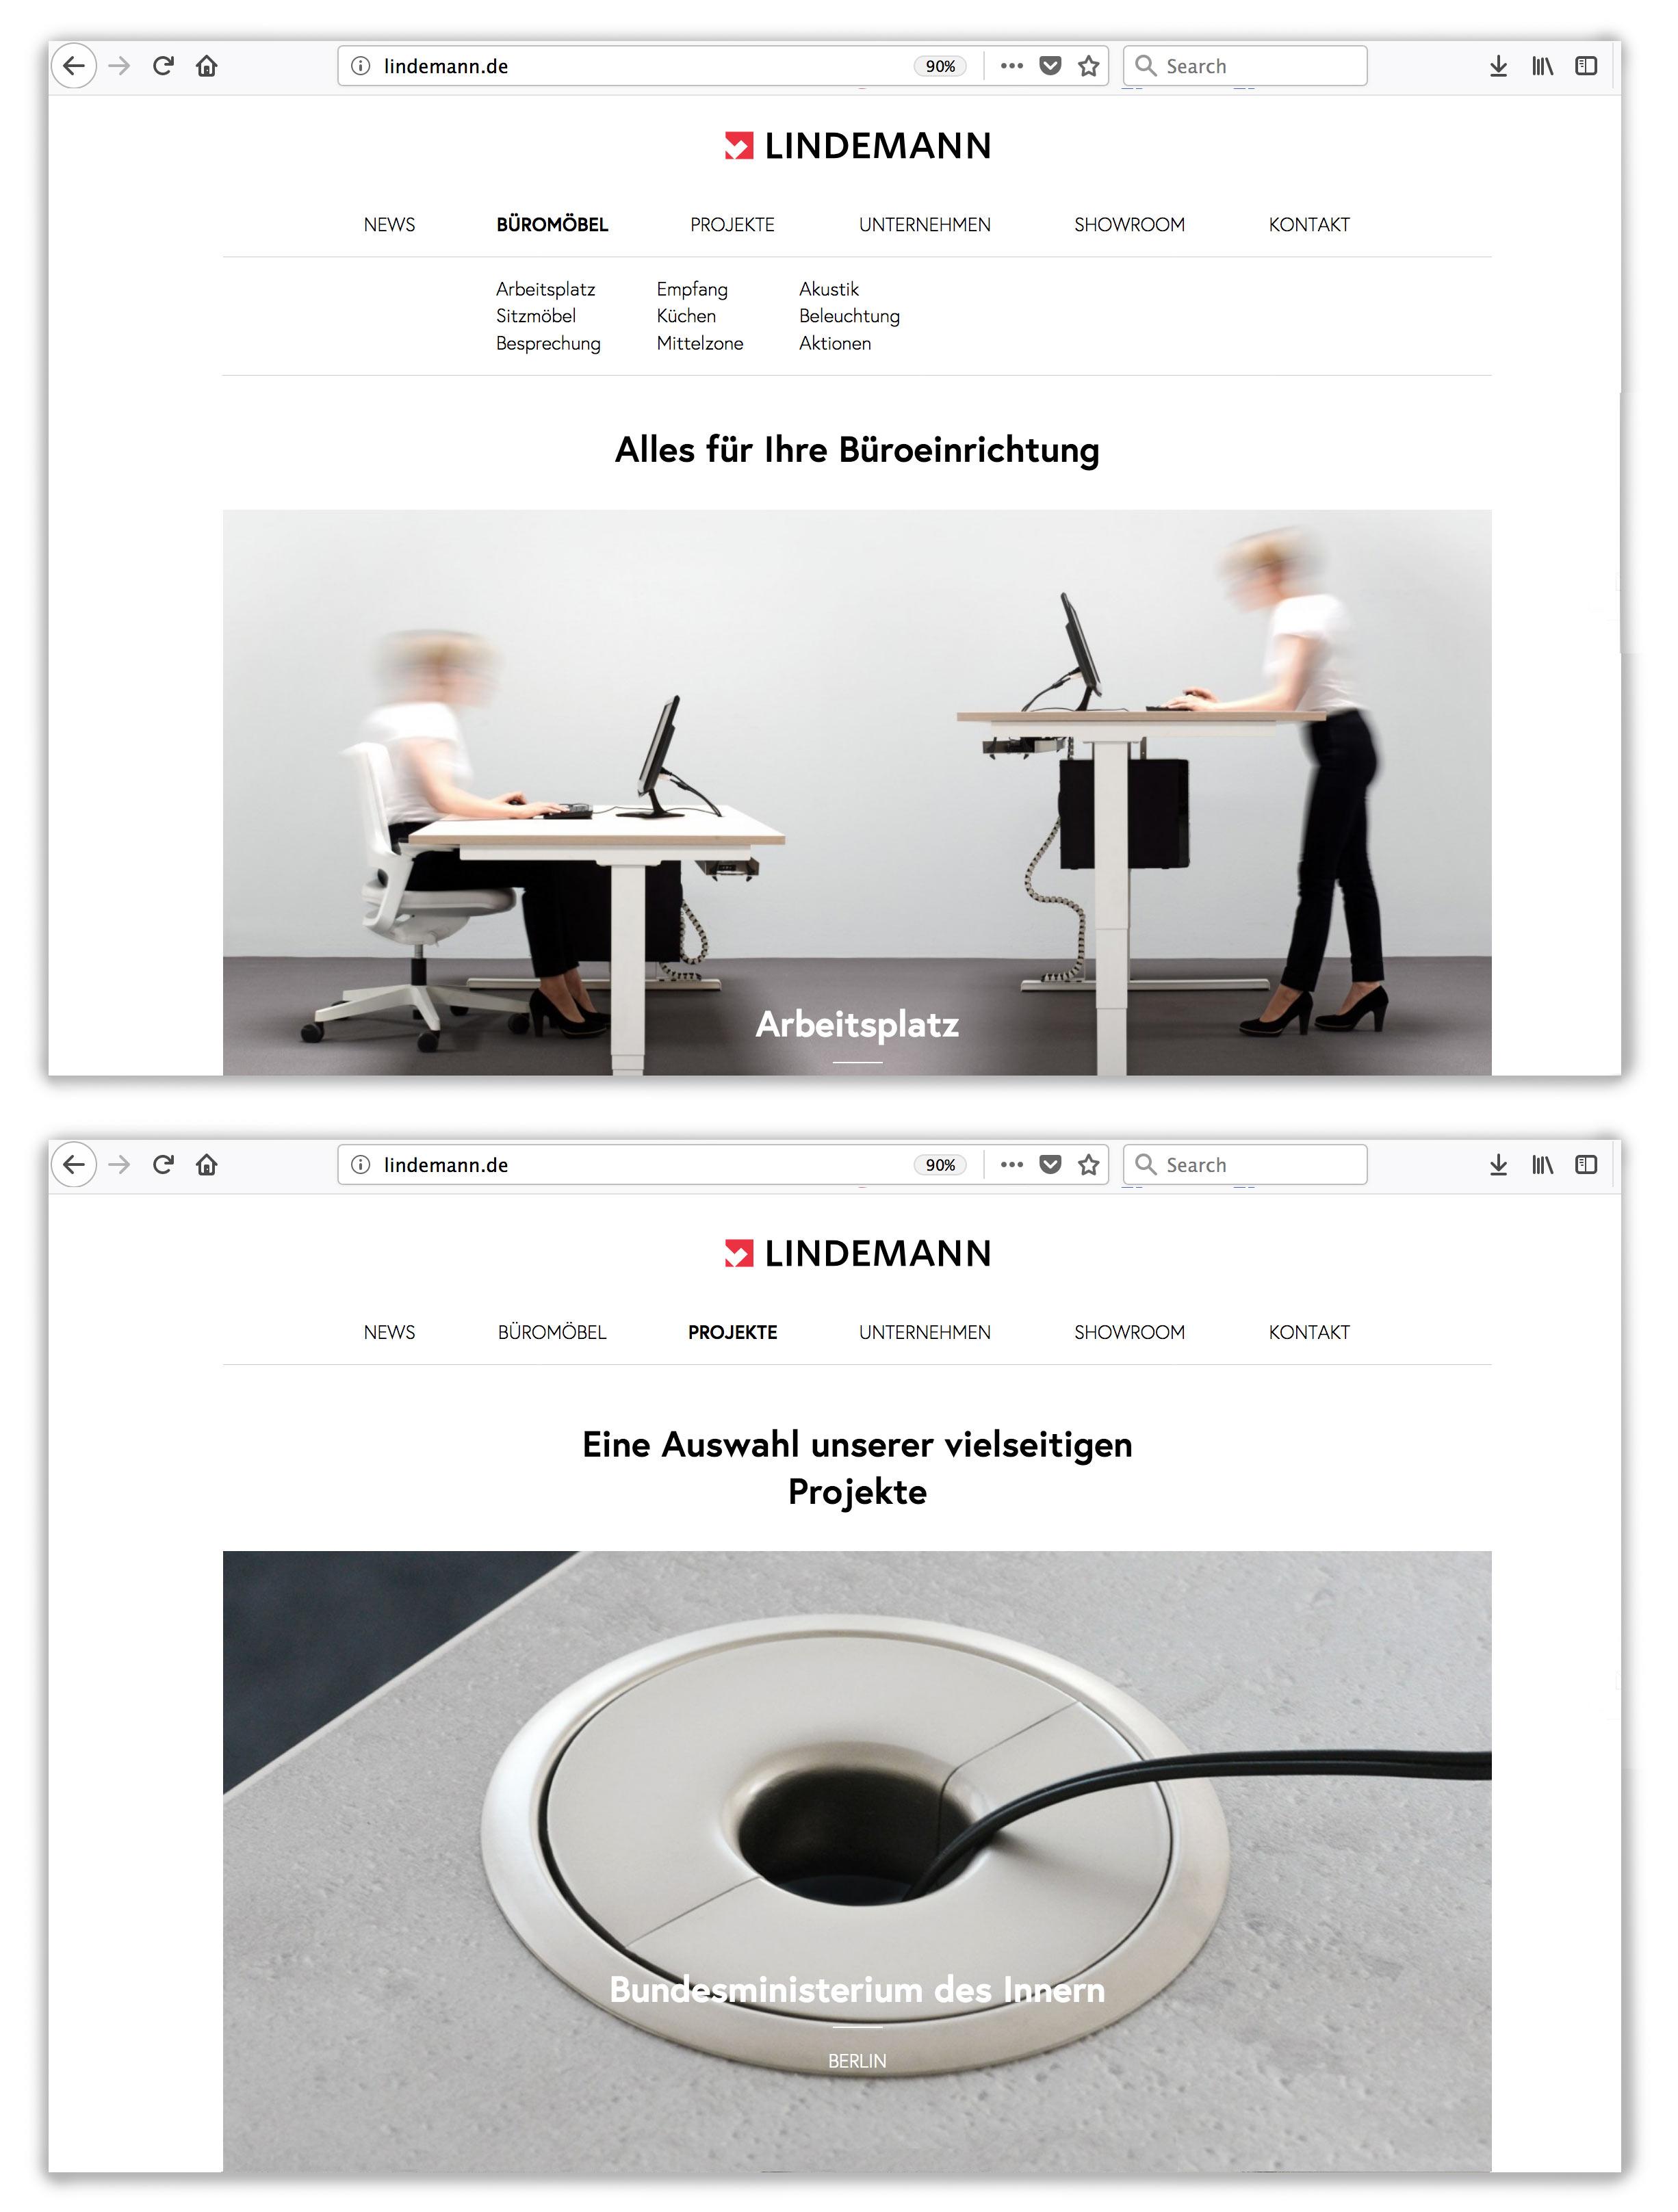 Lindemannwebseite Design Berlin Bueromoebel Office Furniture 1